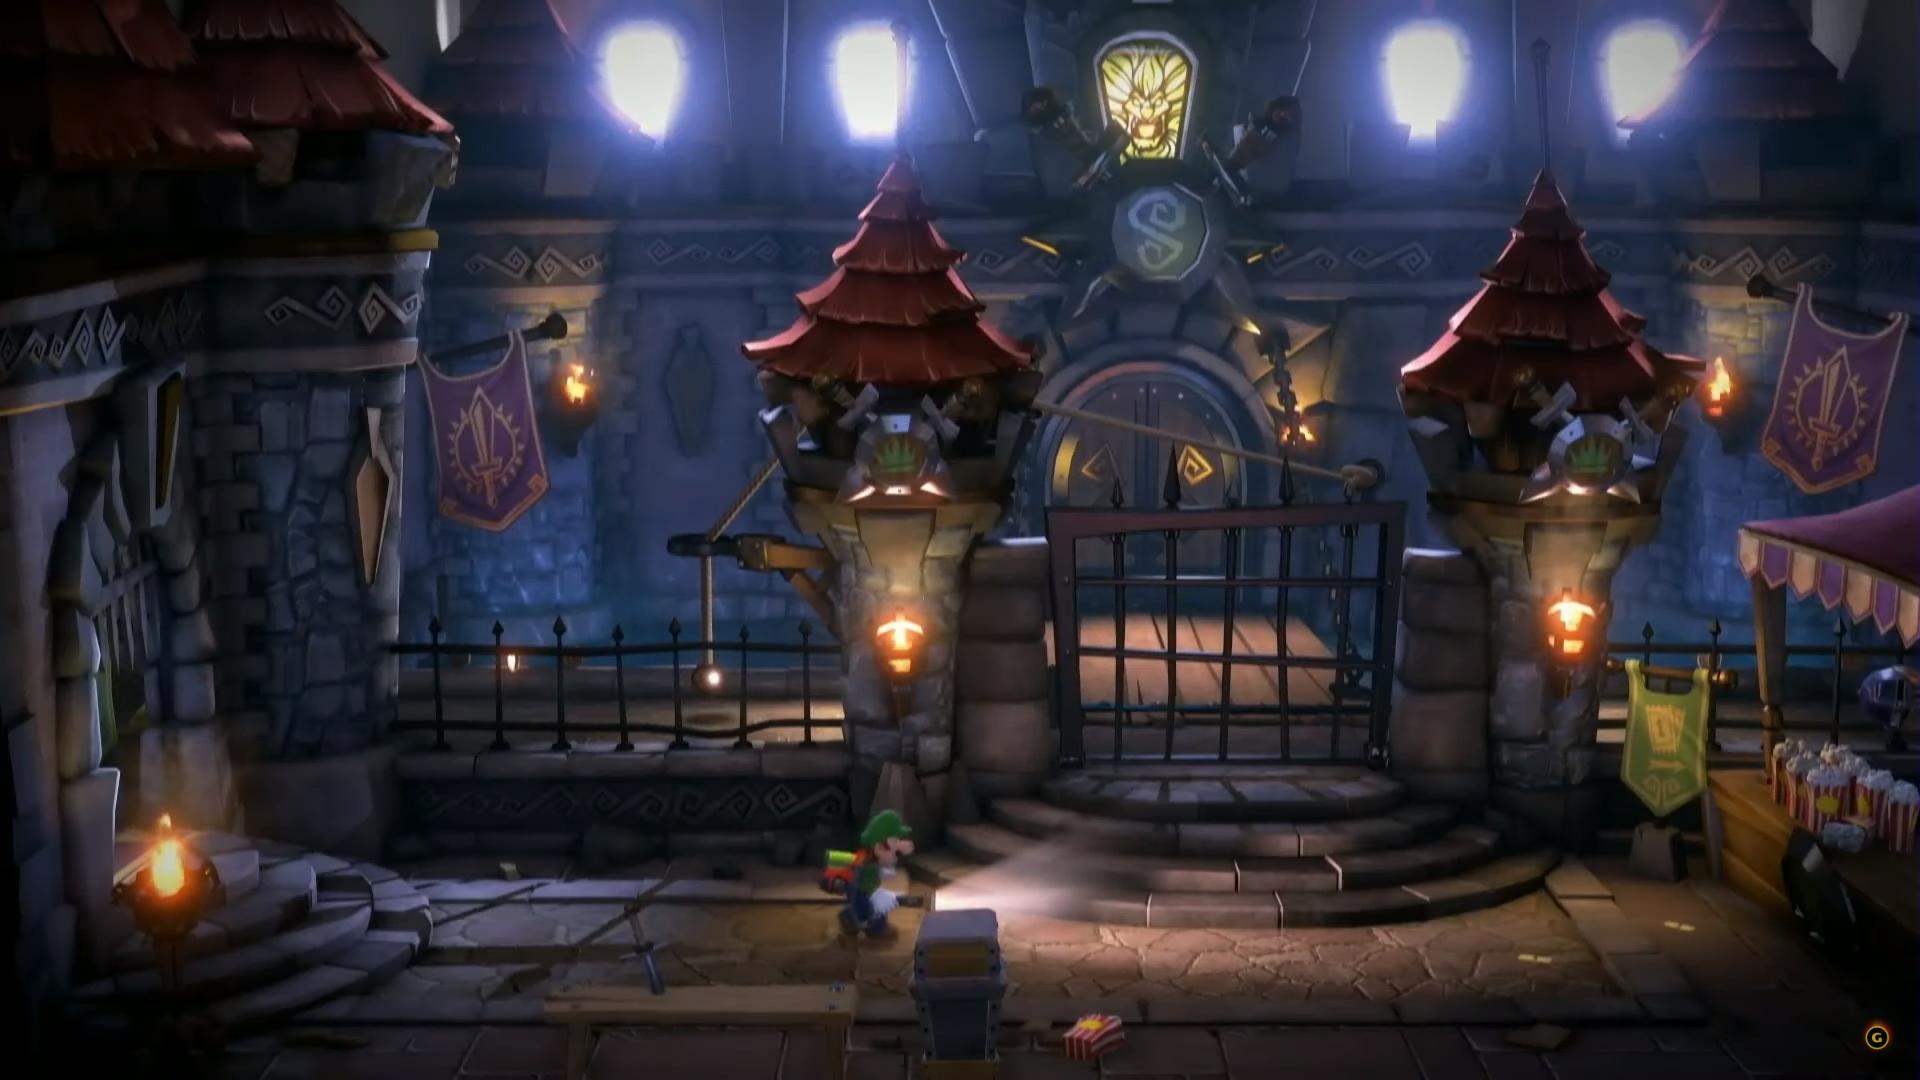 Luigi's Mansion 3 environnement 1